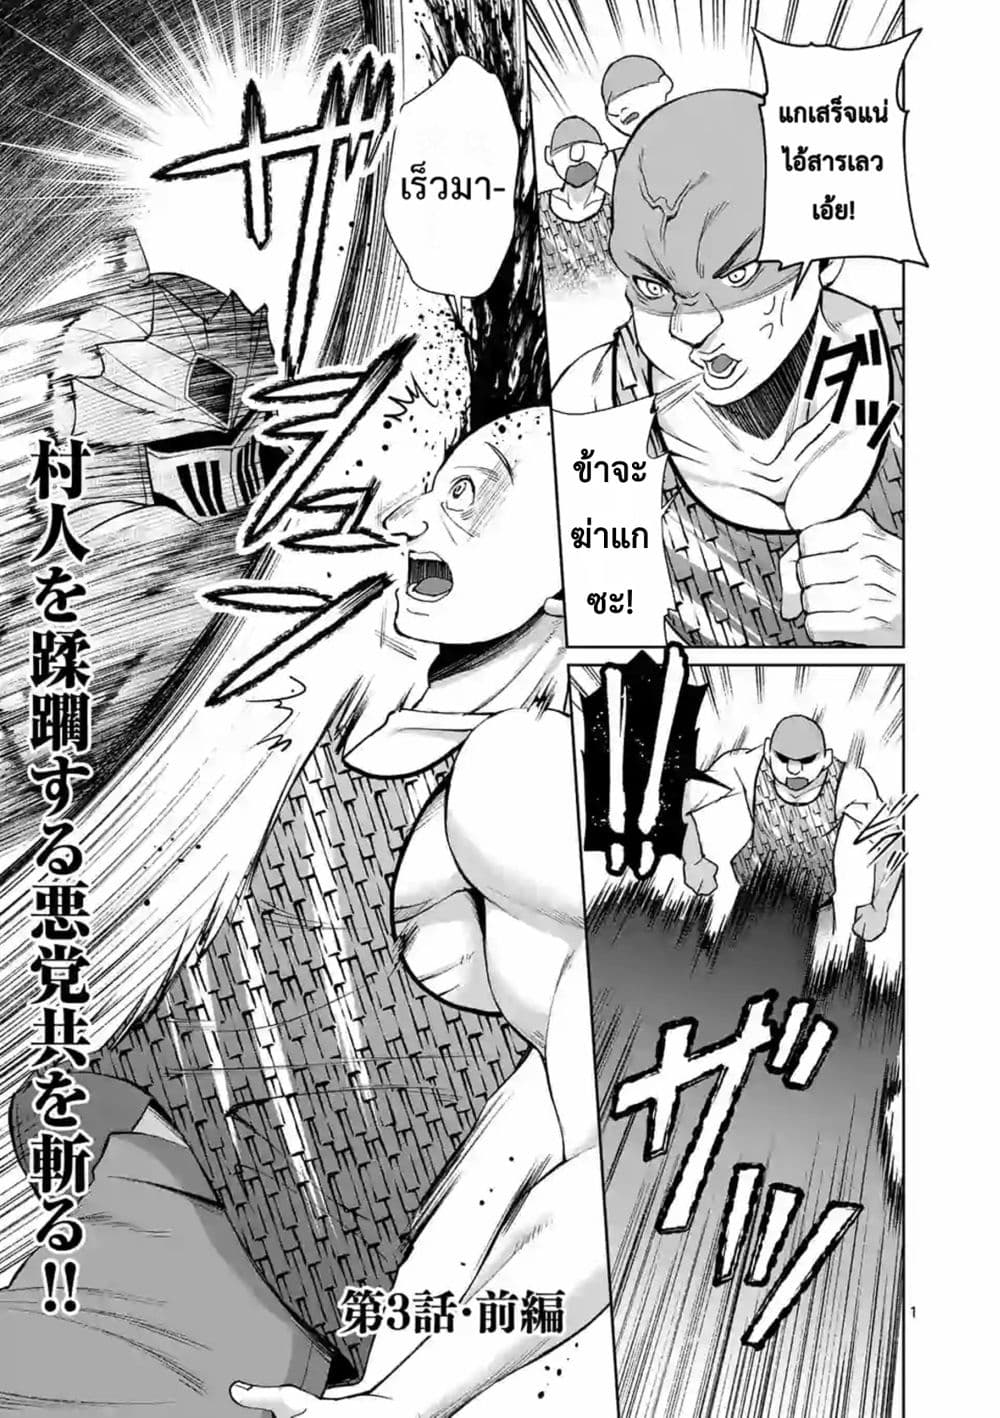 Moto Shogun no Undead Knight-ตอนที่ 3.1